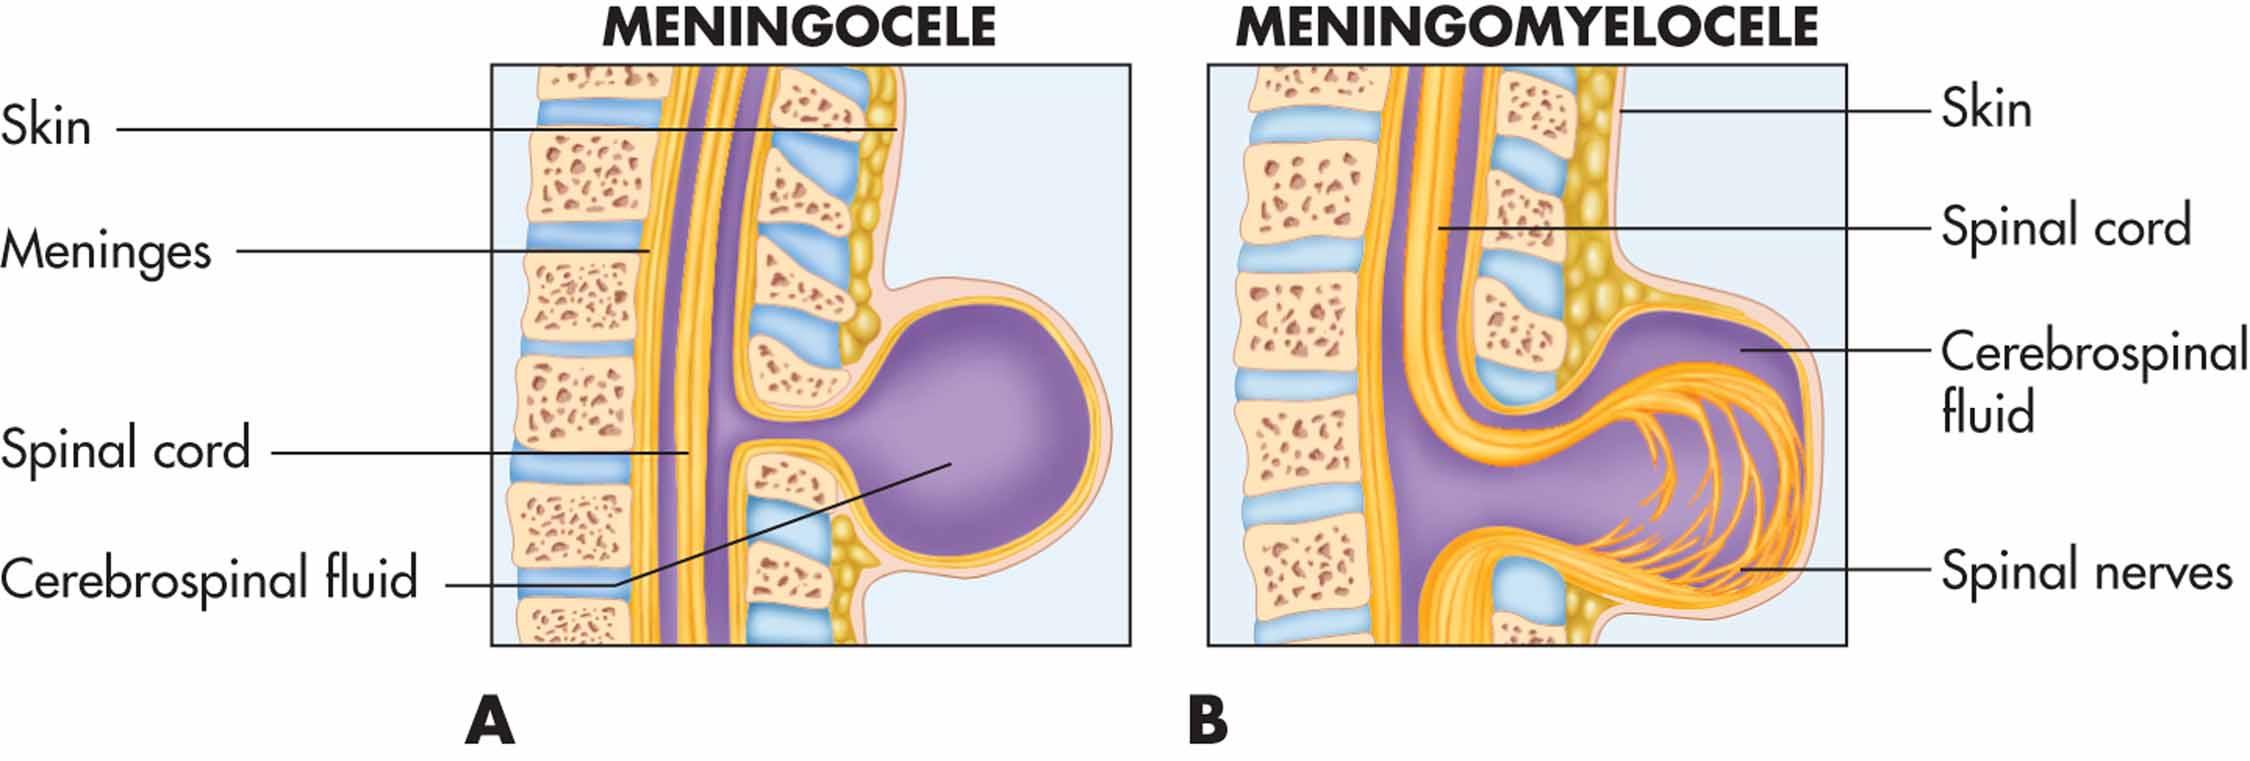 Meningomyelocele Myelocele Myelomeningocele